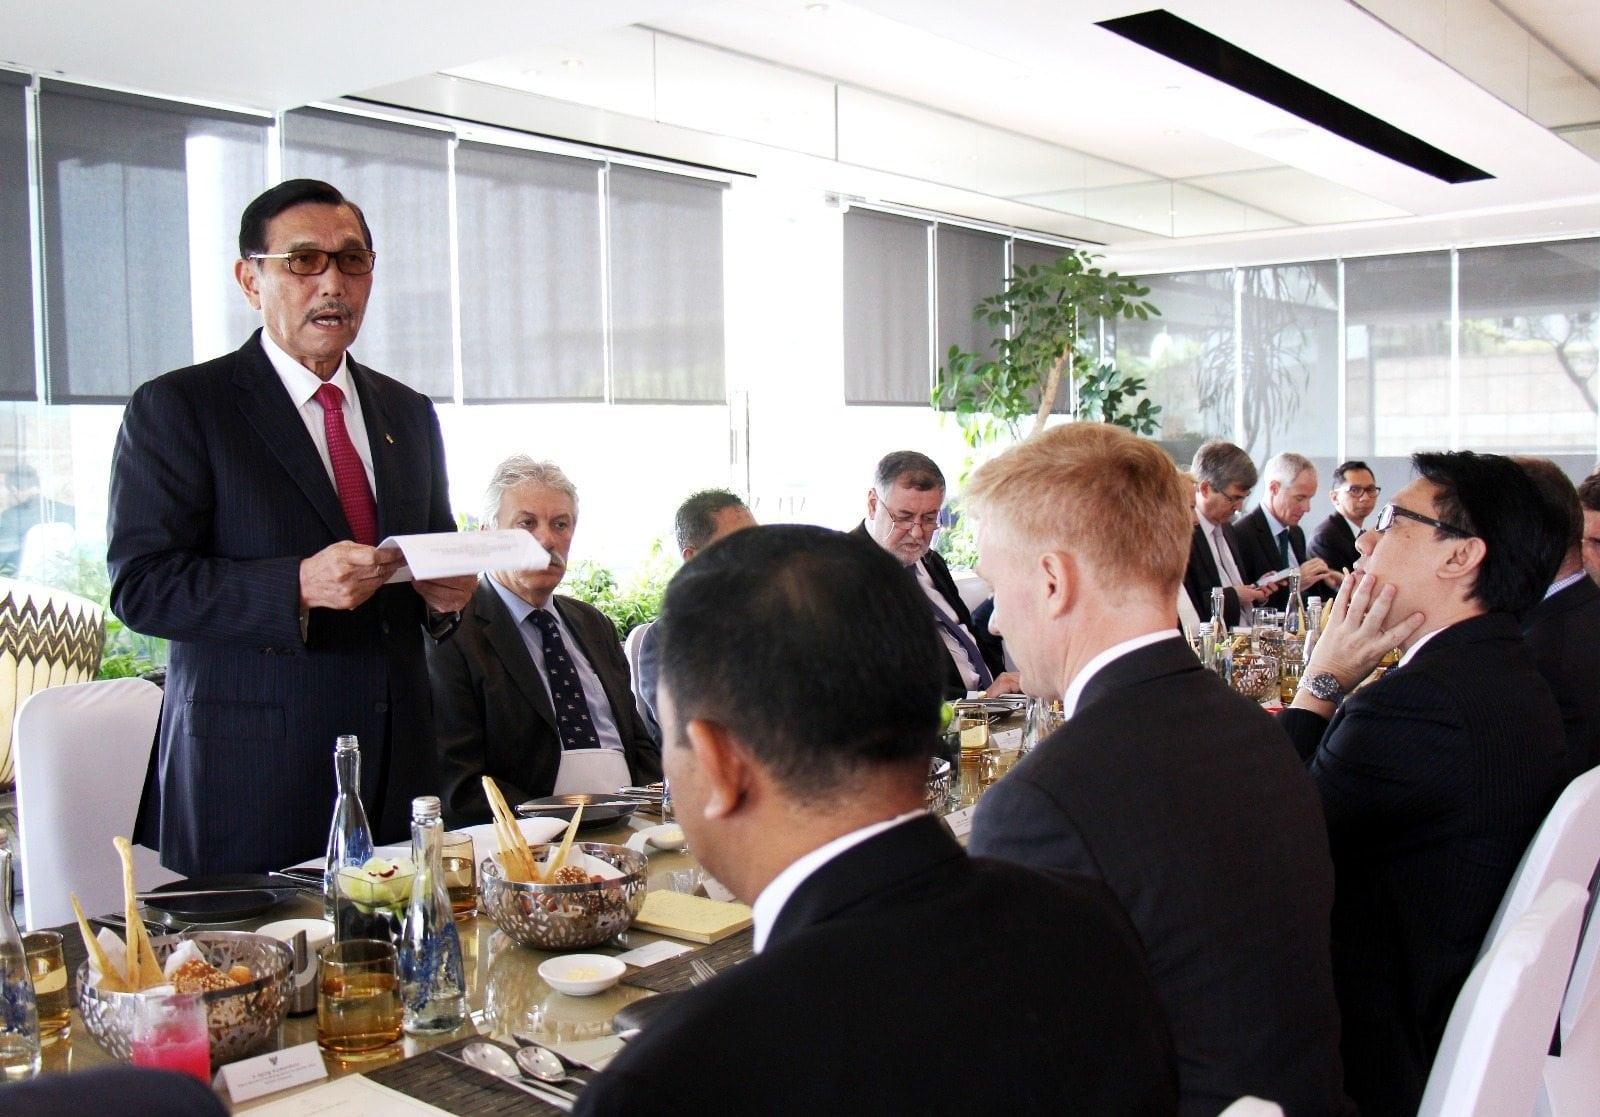 Adakan Lunch Meeting, Menko Luhut Temui Para Duta Besar Uni Eropa